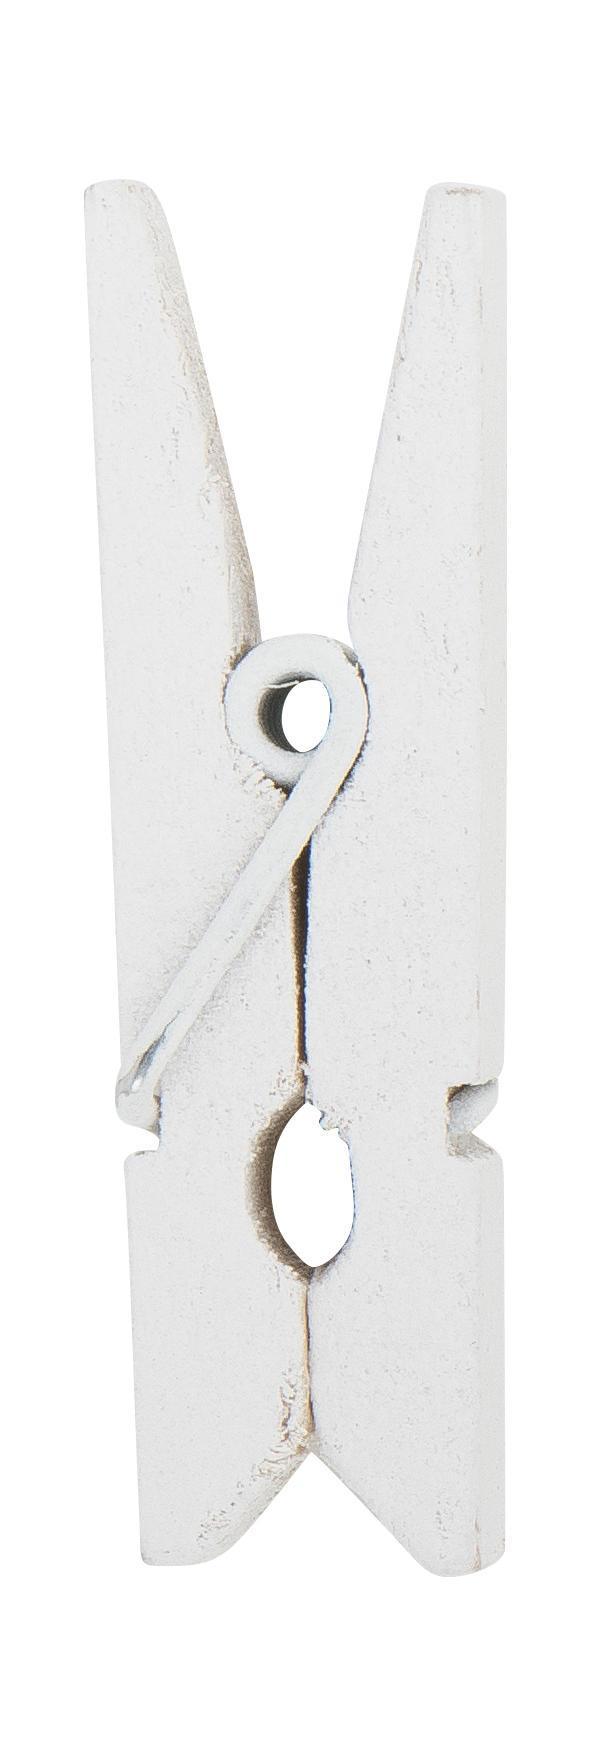 IB LAURSEN Mini dřevěné kolíčky White - 10 ks, bílá barva, dřevo